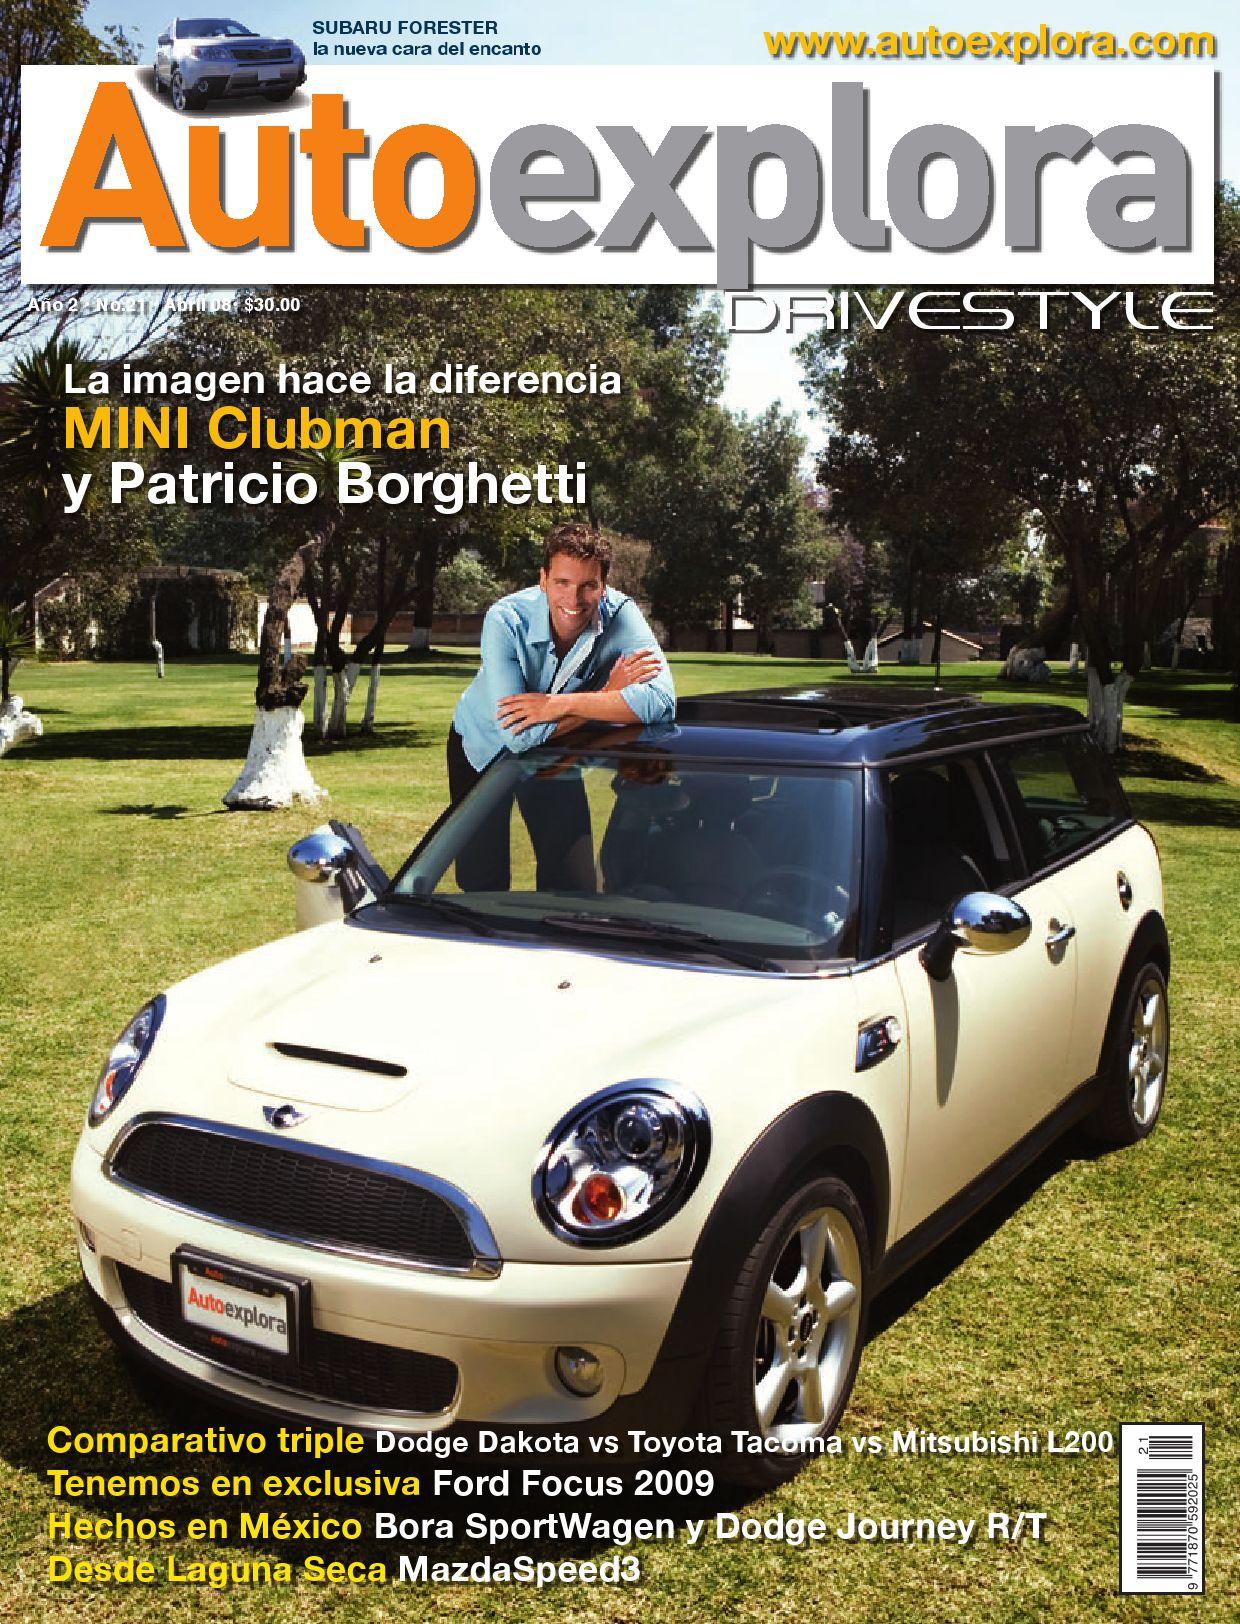 Autoexplora La Revista No.21 by Autoexplora - issuu